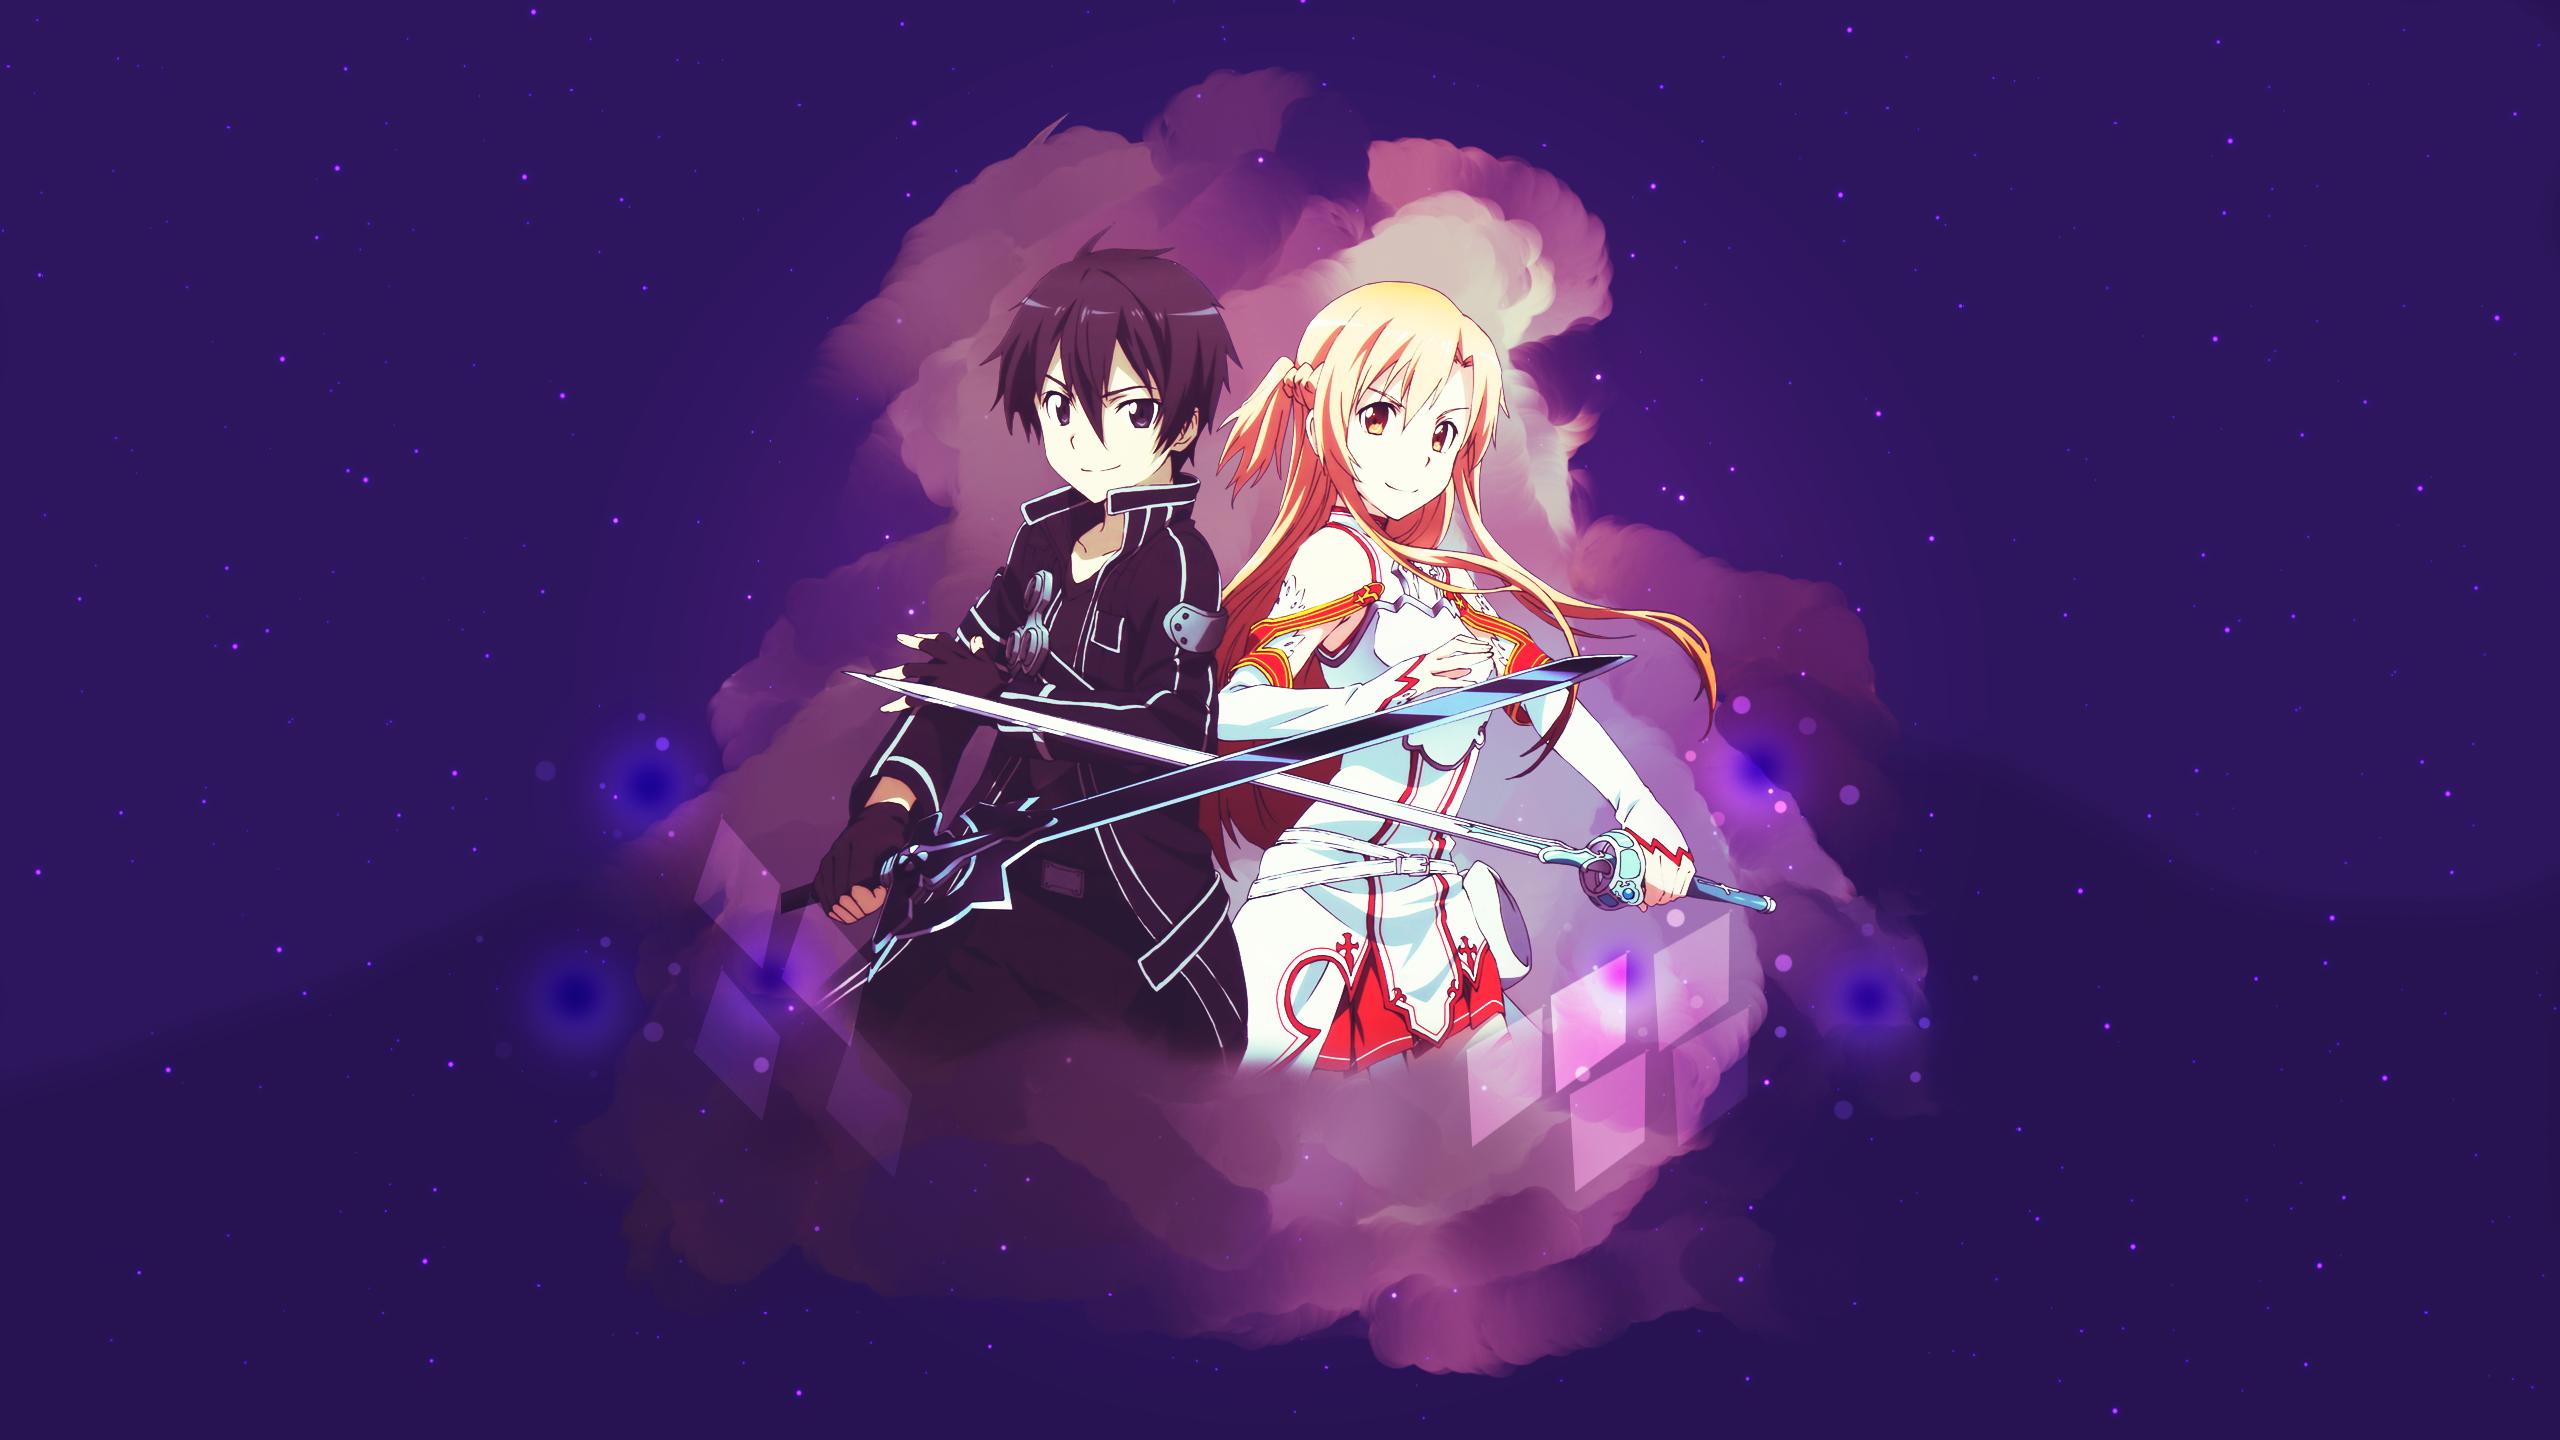 Asuna Yuuki Kazuto Kirigaya Kirito Sword Art Online Sword Art Online Wallpaper Resolution 2560x1440 Id 910066 Wallha Com